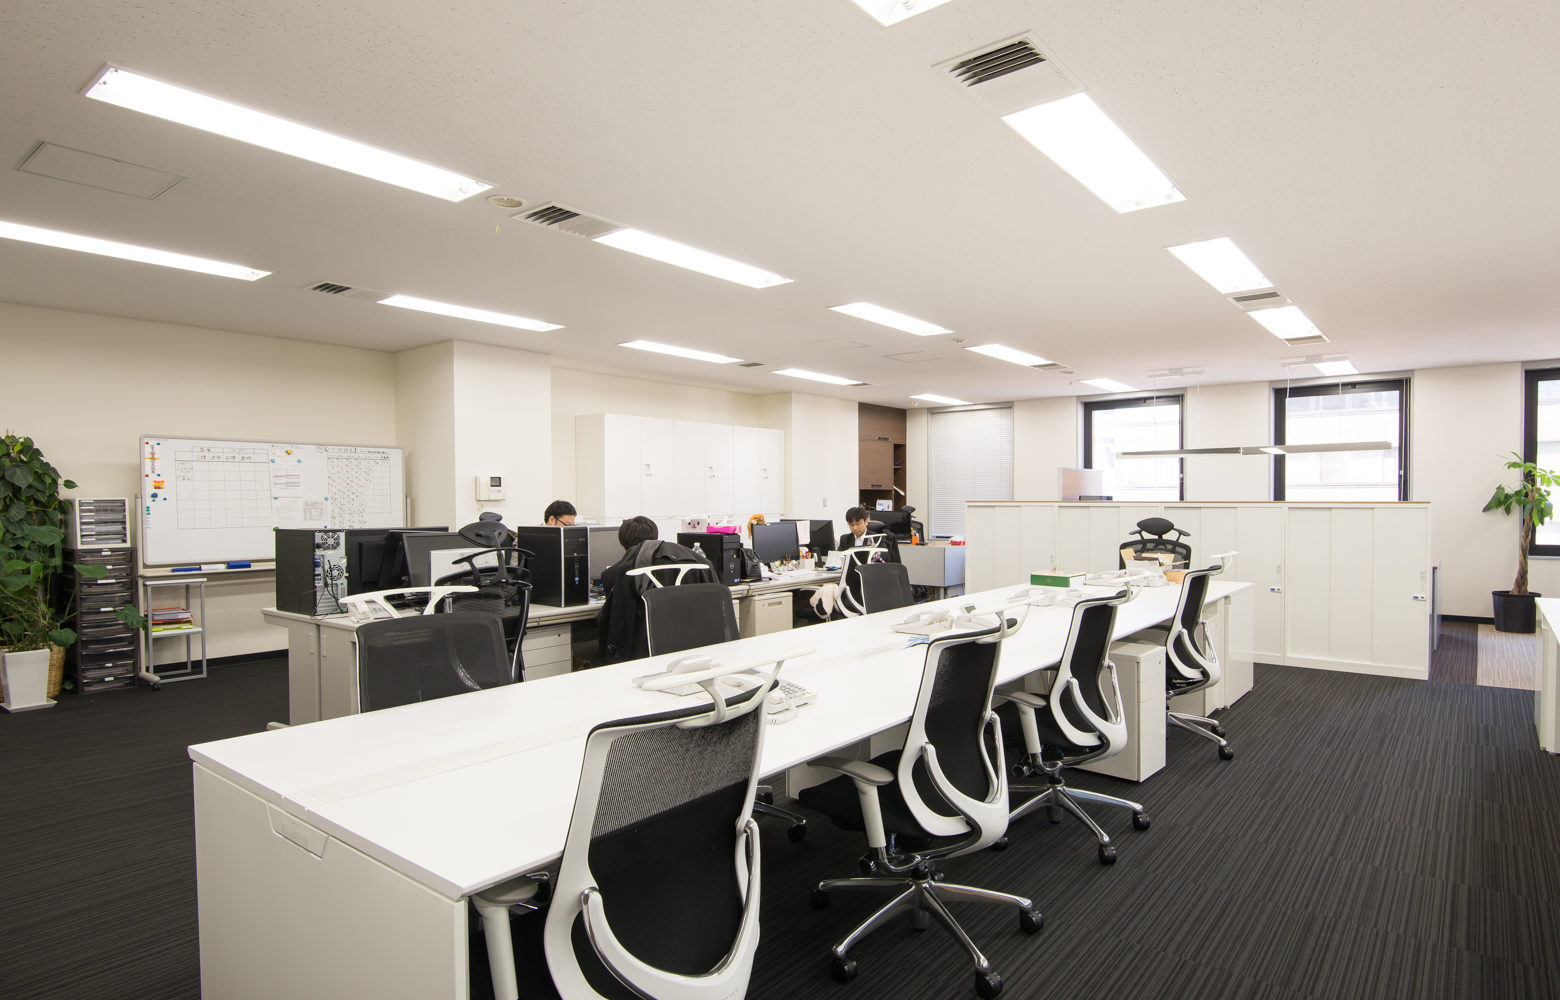 ECマーケティング株式会社 Work Space_2 デザイン・レイアウト事例